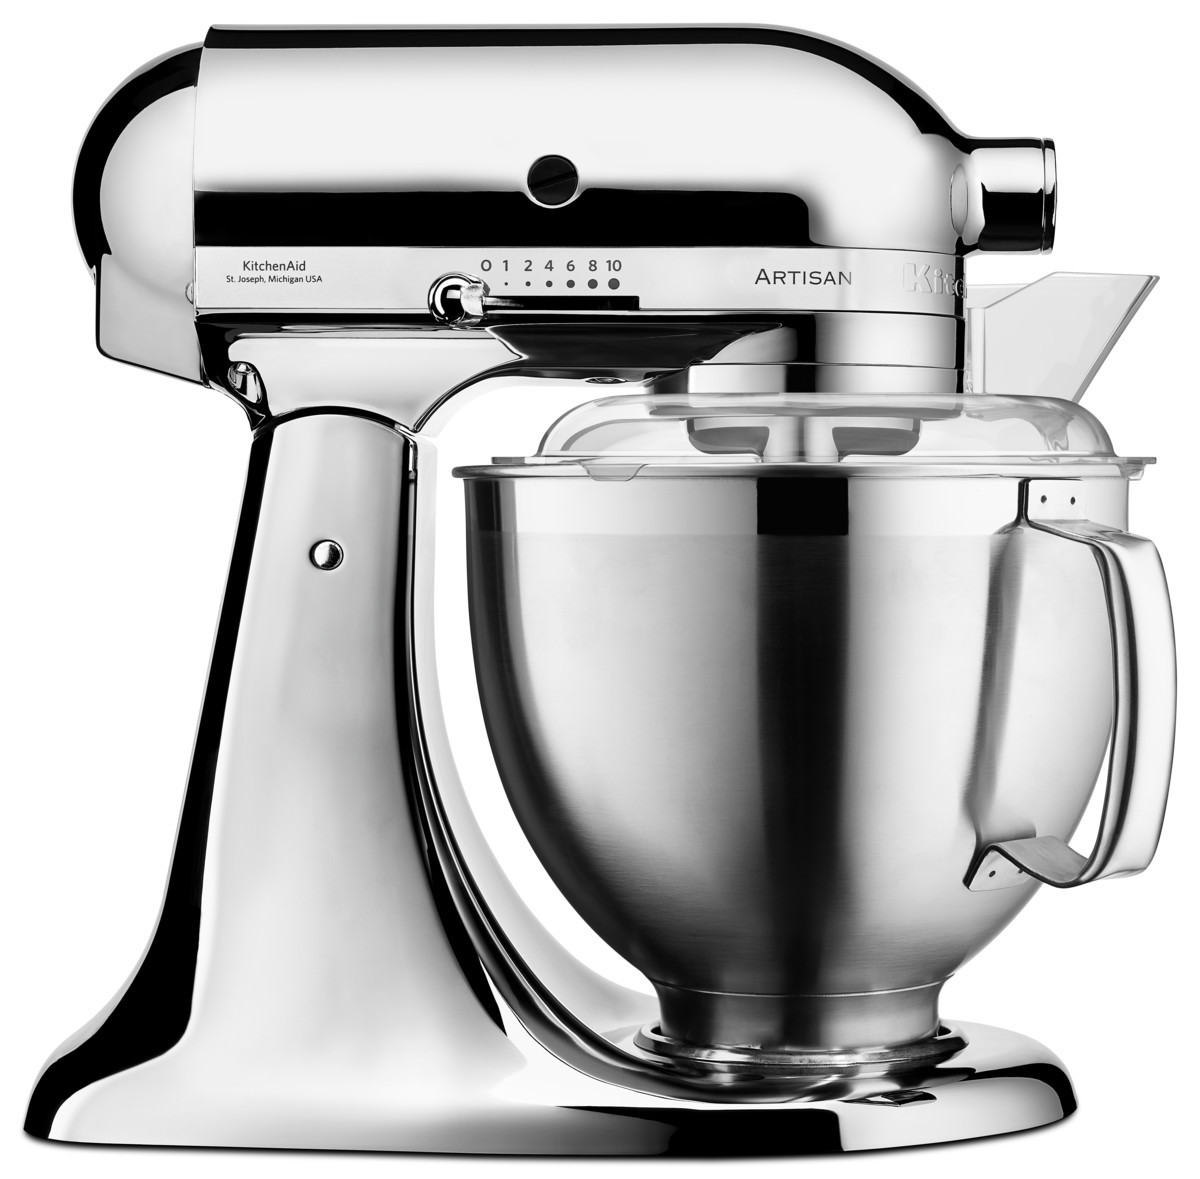 KitchenAid Küchenmaschine 5KSM185PS Premium Edition